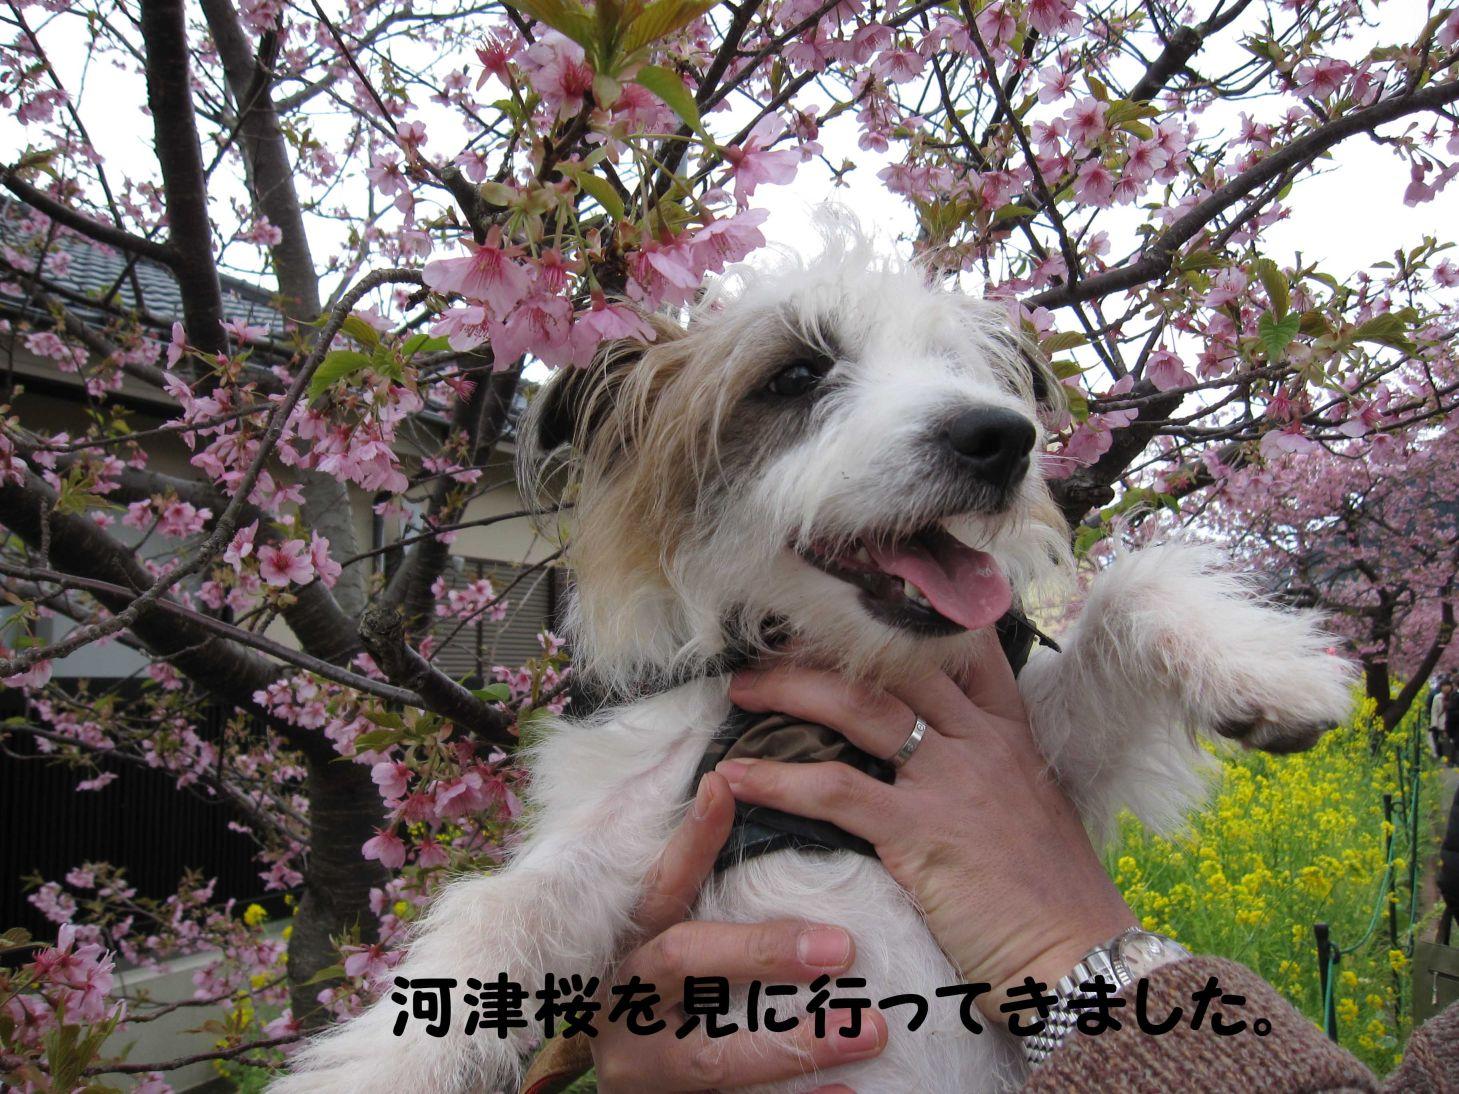 s_河津桜を見に行ってきました